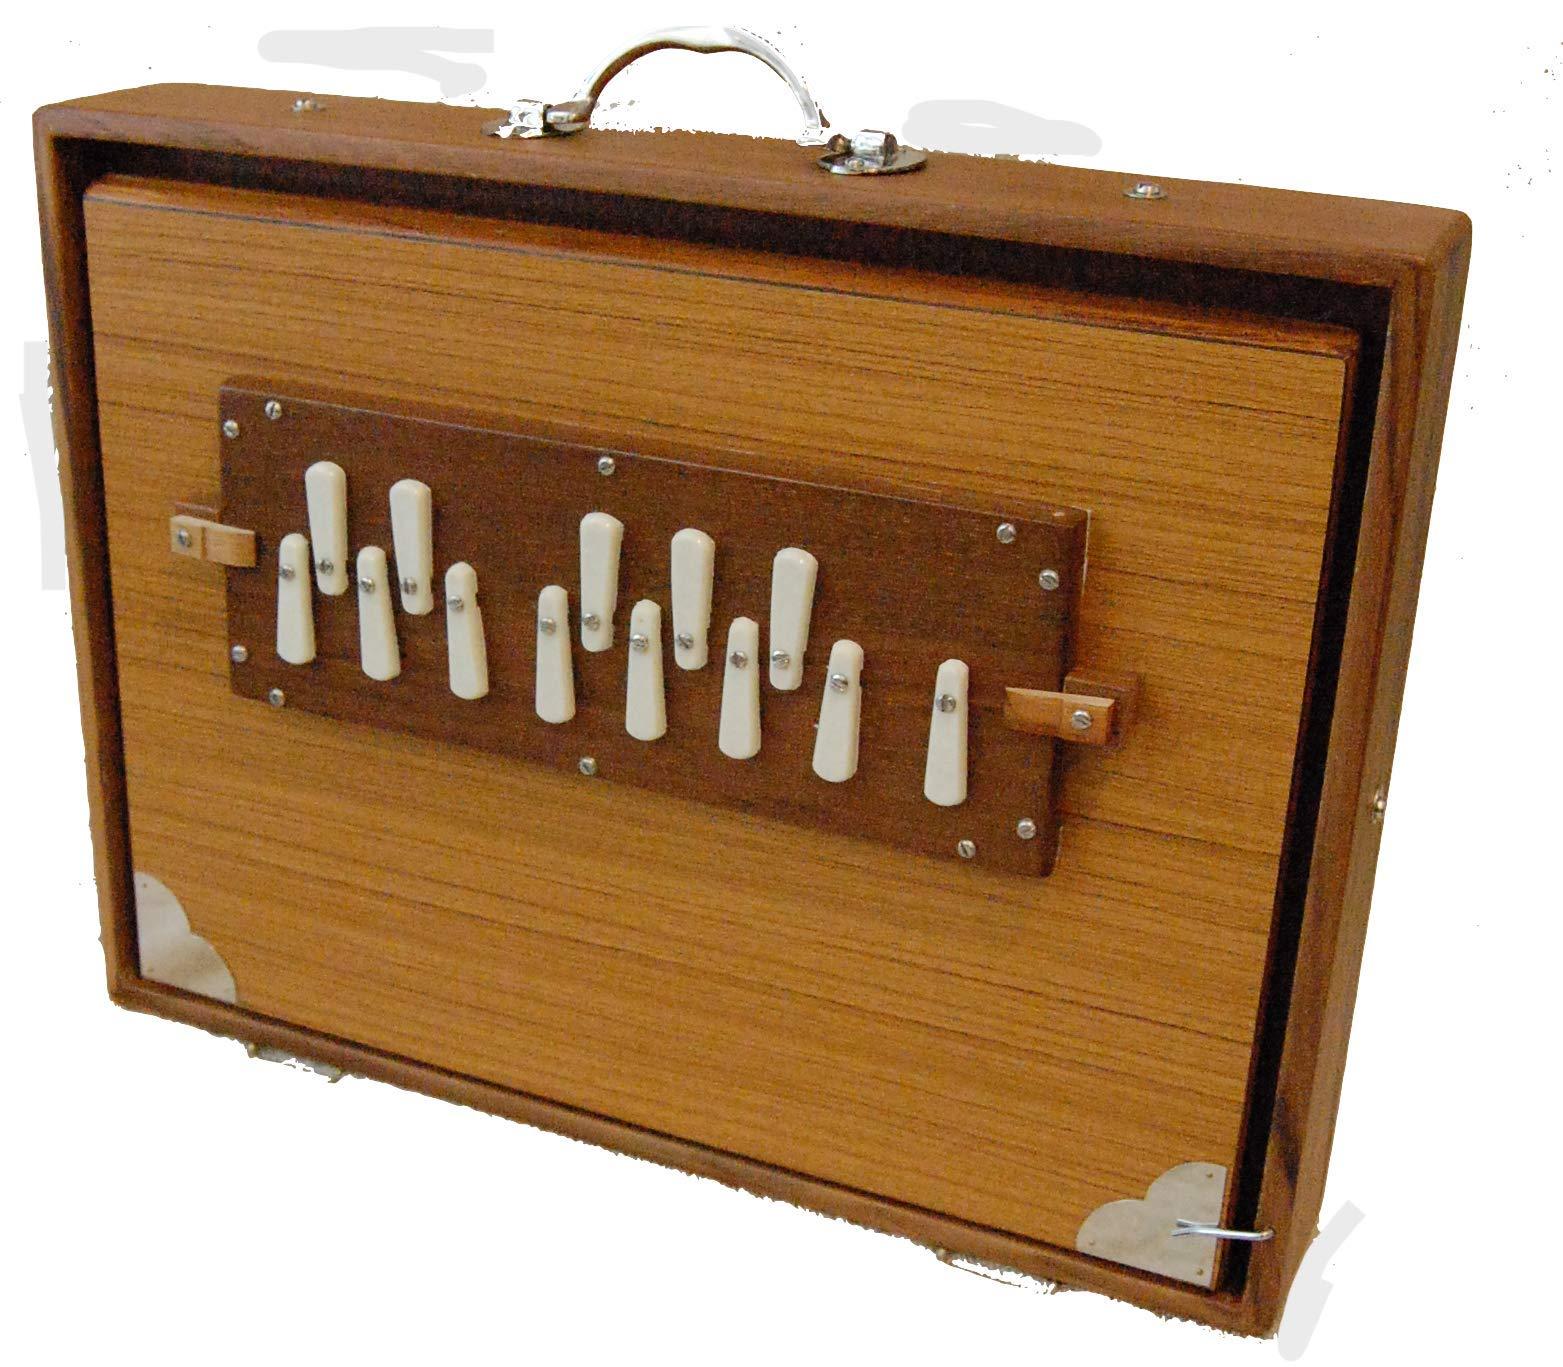 Monoj Kr. Sardar X Brooklyn Healing Arts Large Shruti Box by Monoj Kr. Sardar & Bros.